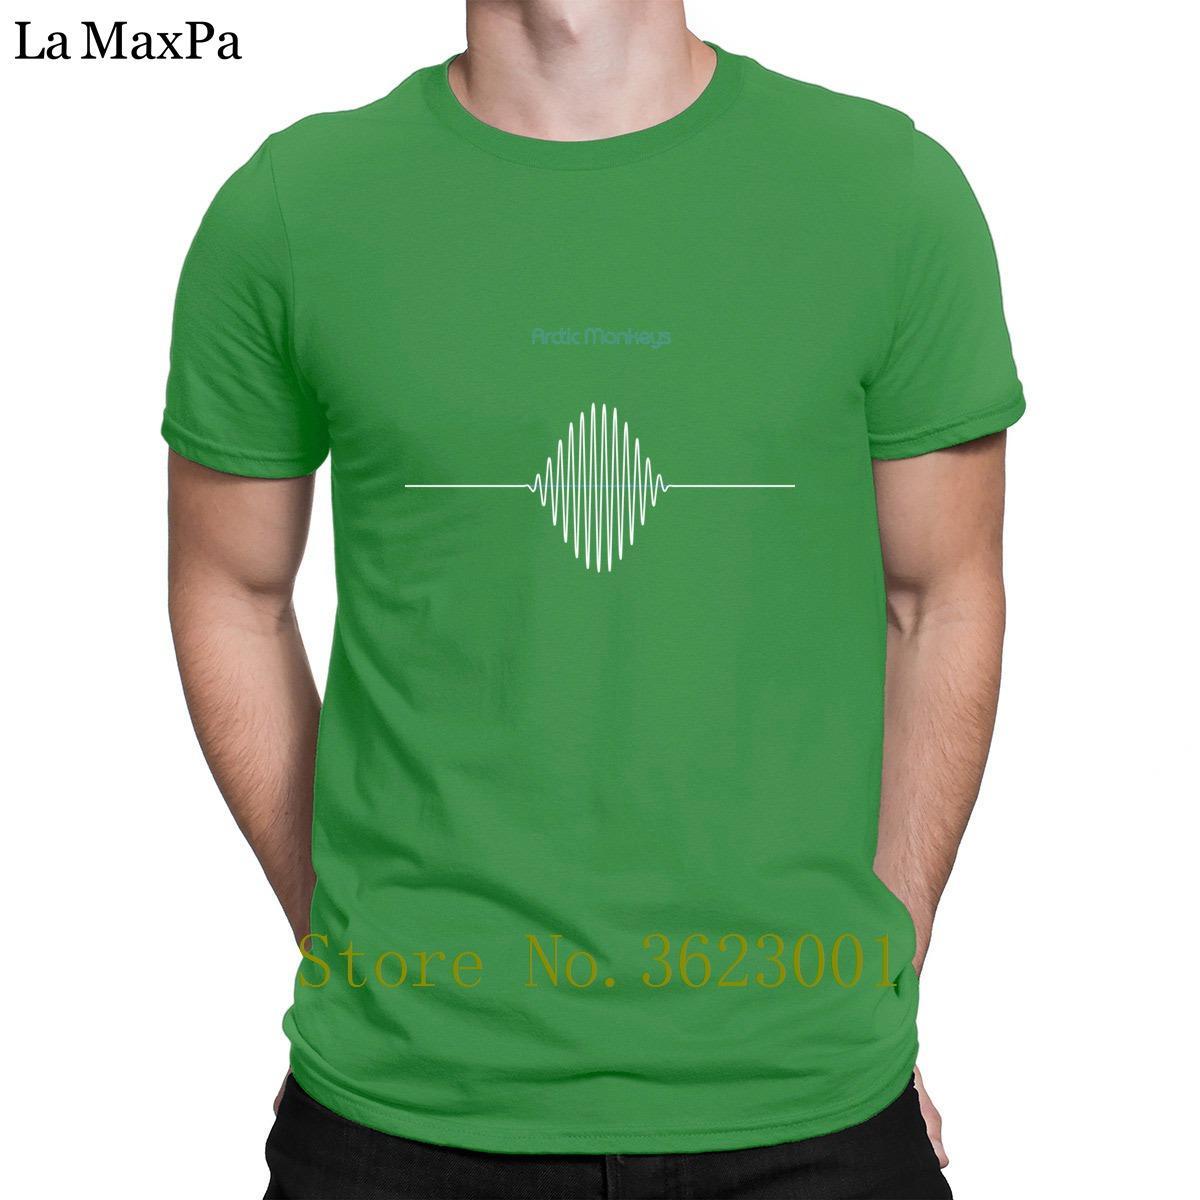 Personalizado letra Camisetas Arctic Monkeys dos homens T Shirt Summer Style T-Shirt Authentic divertimento camiseta Hip Hop Crew Neck